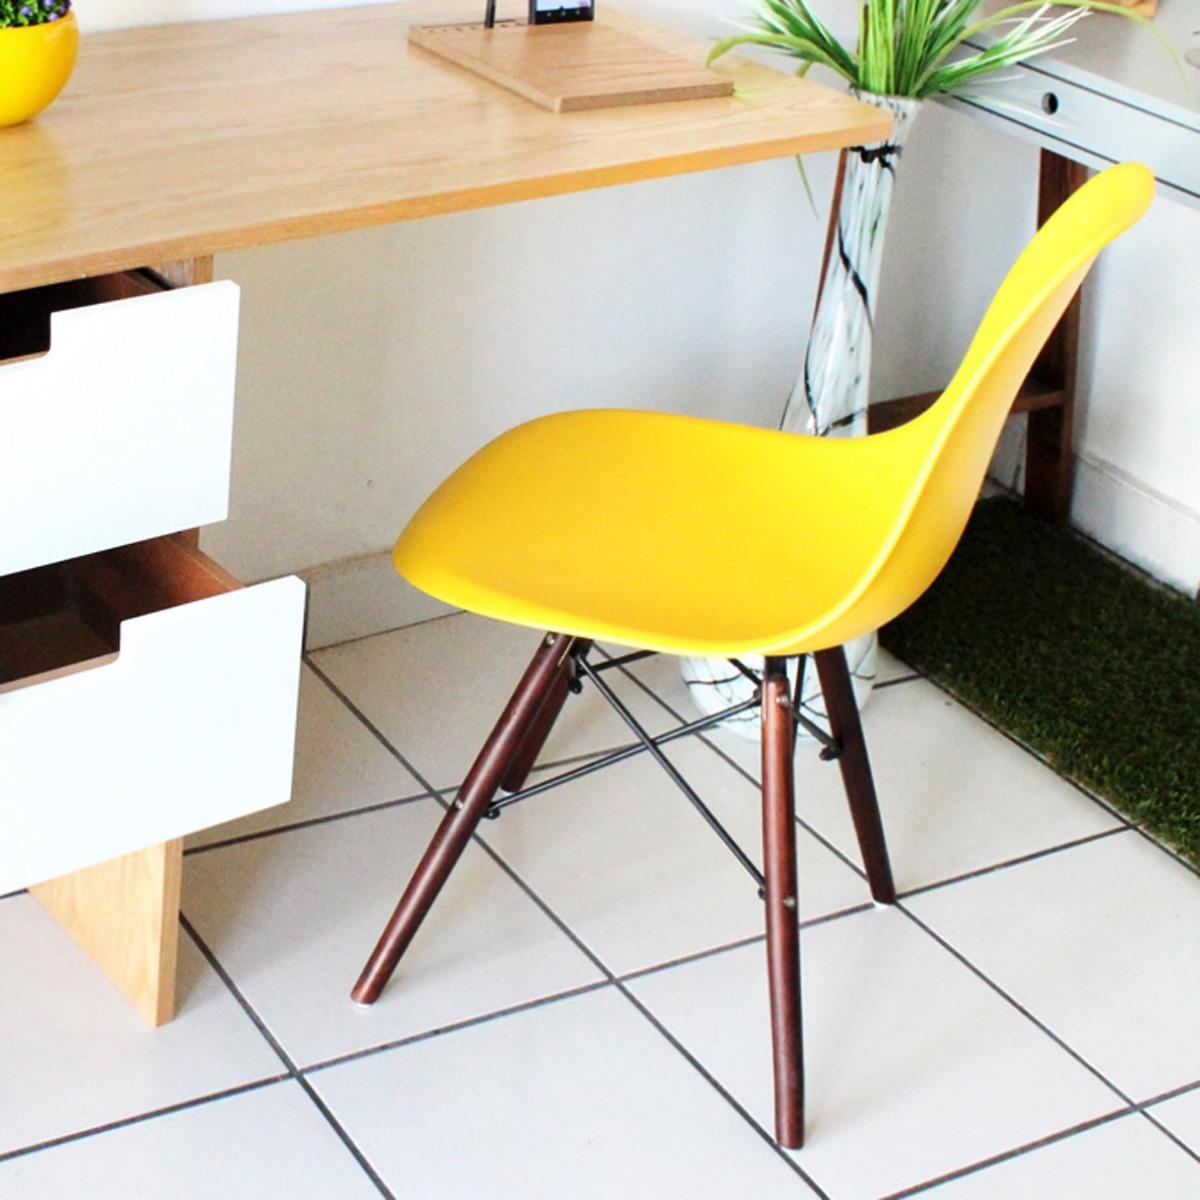 Famoso Amarilla Muebles Silla Mecedora Imagen - Muebles Para Ideas ...